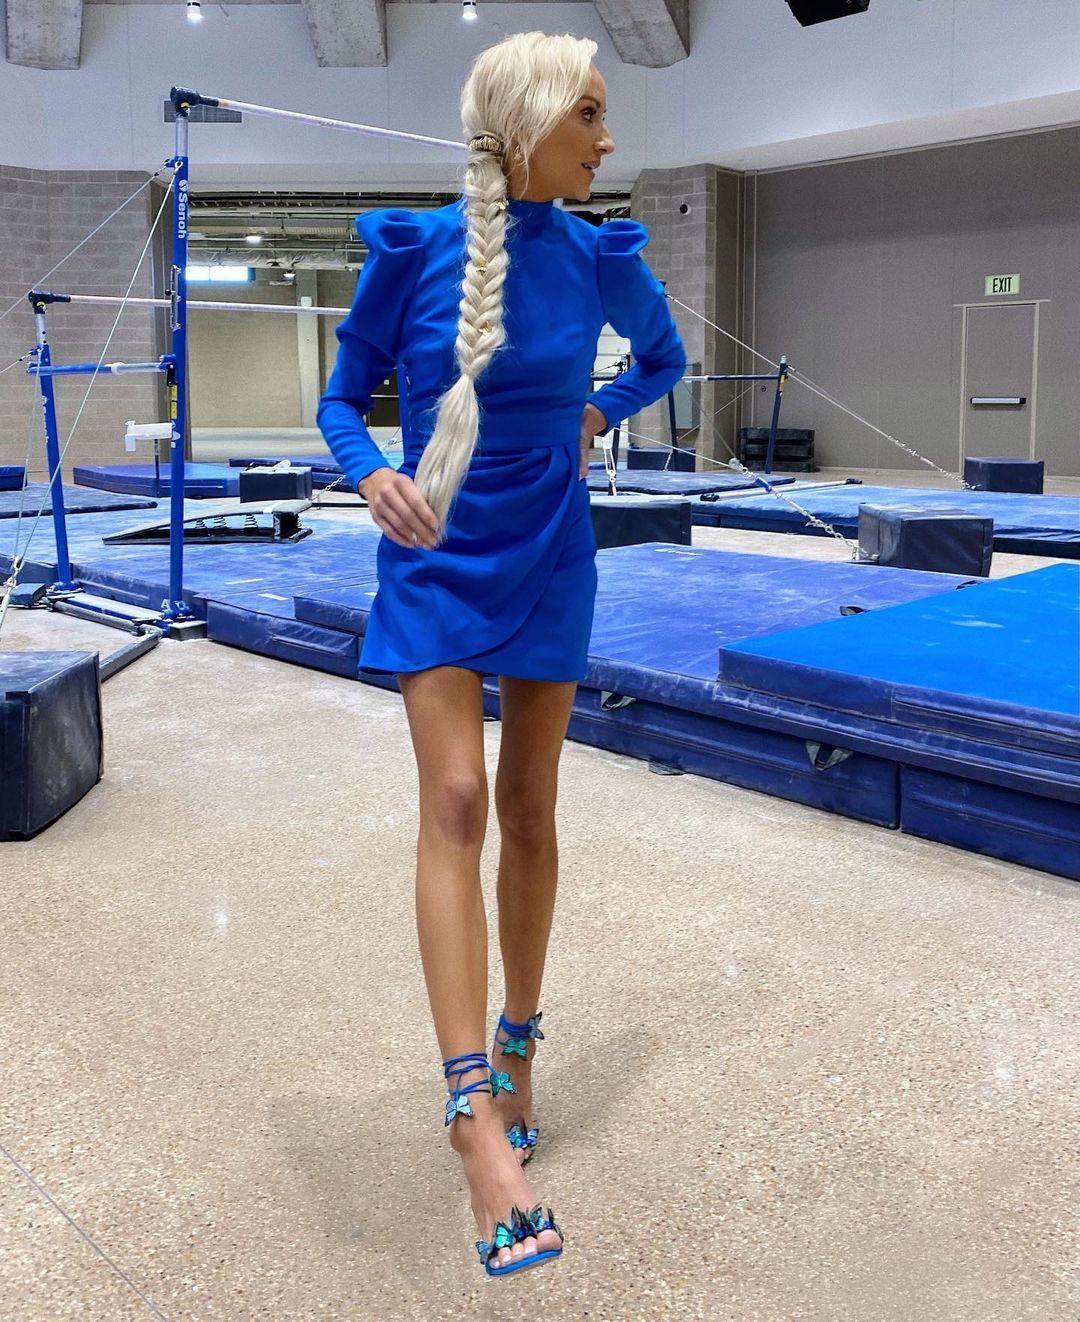 Nastia Liukin indoors in short dress